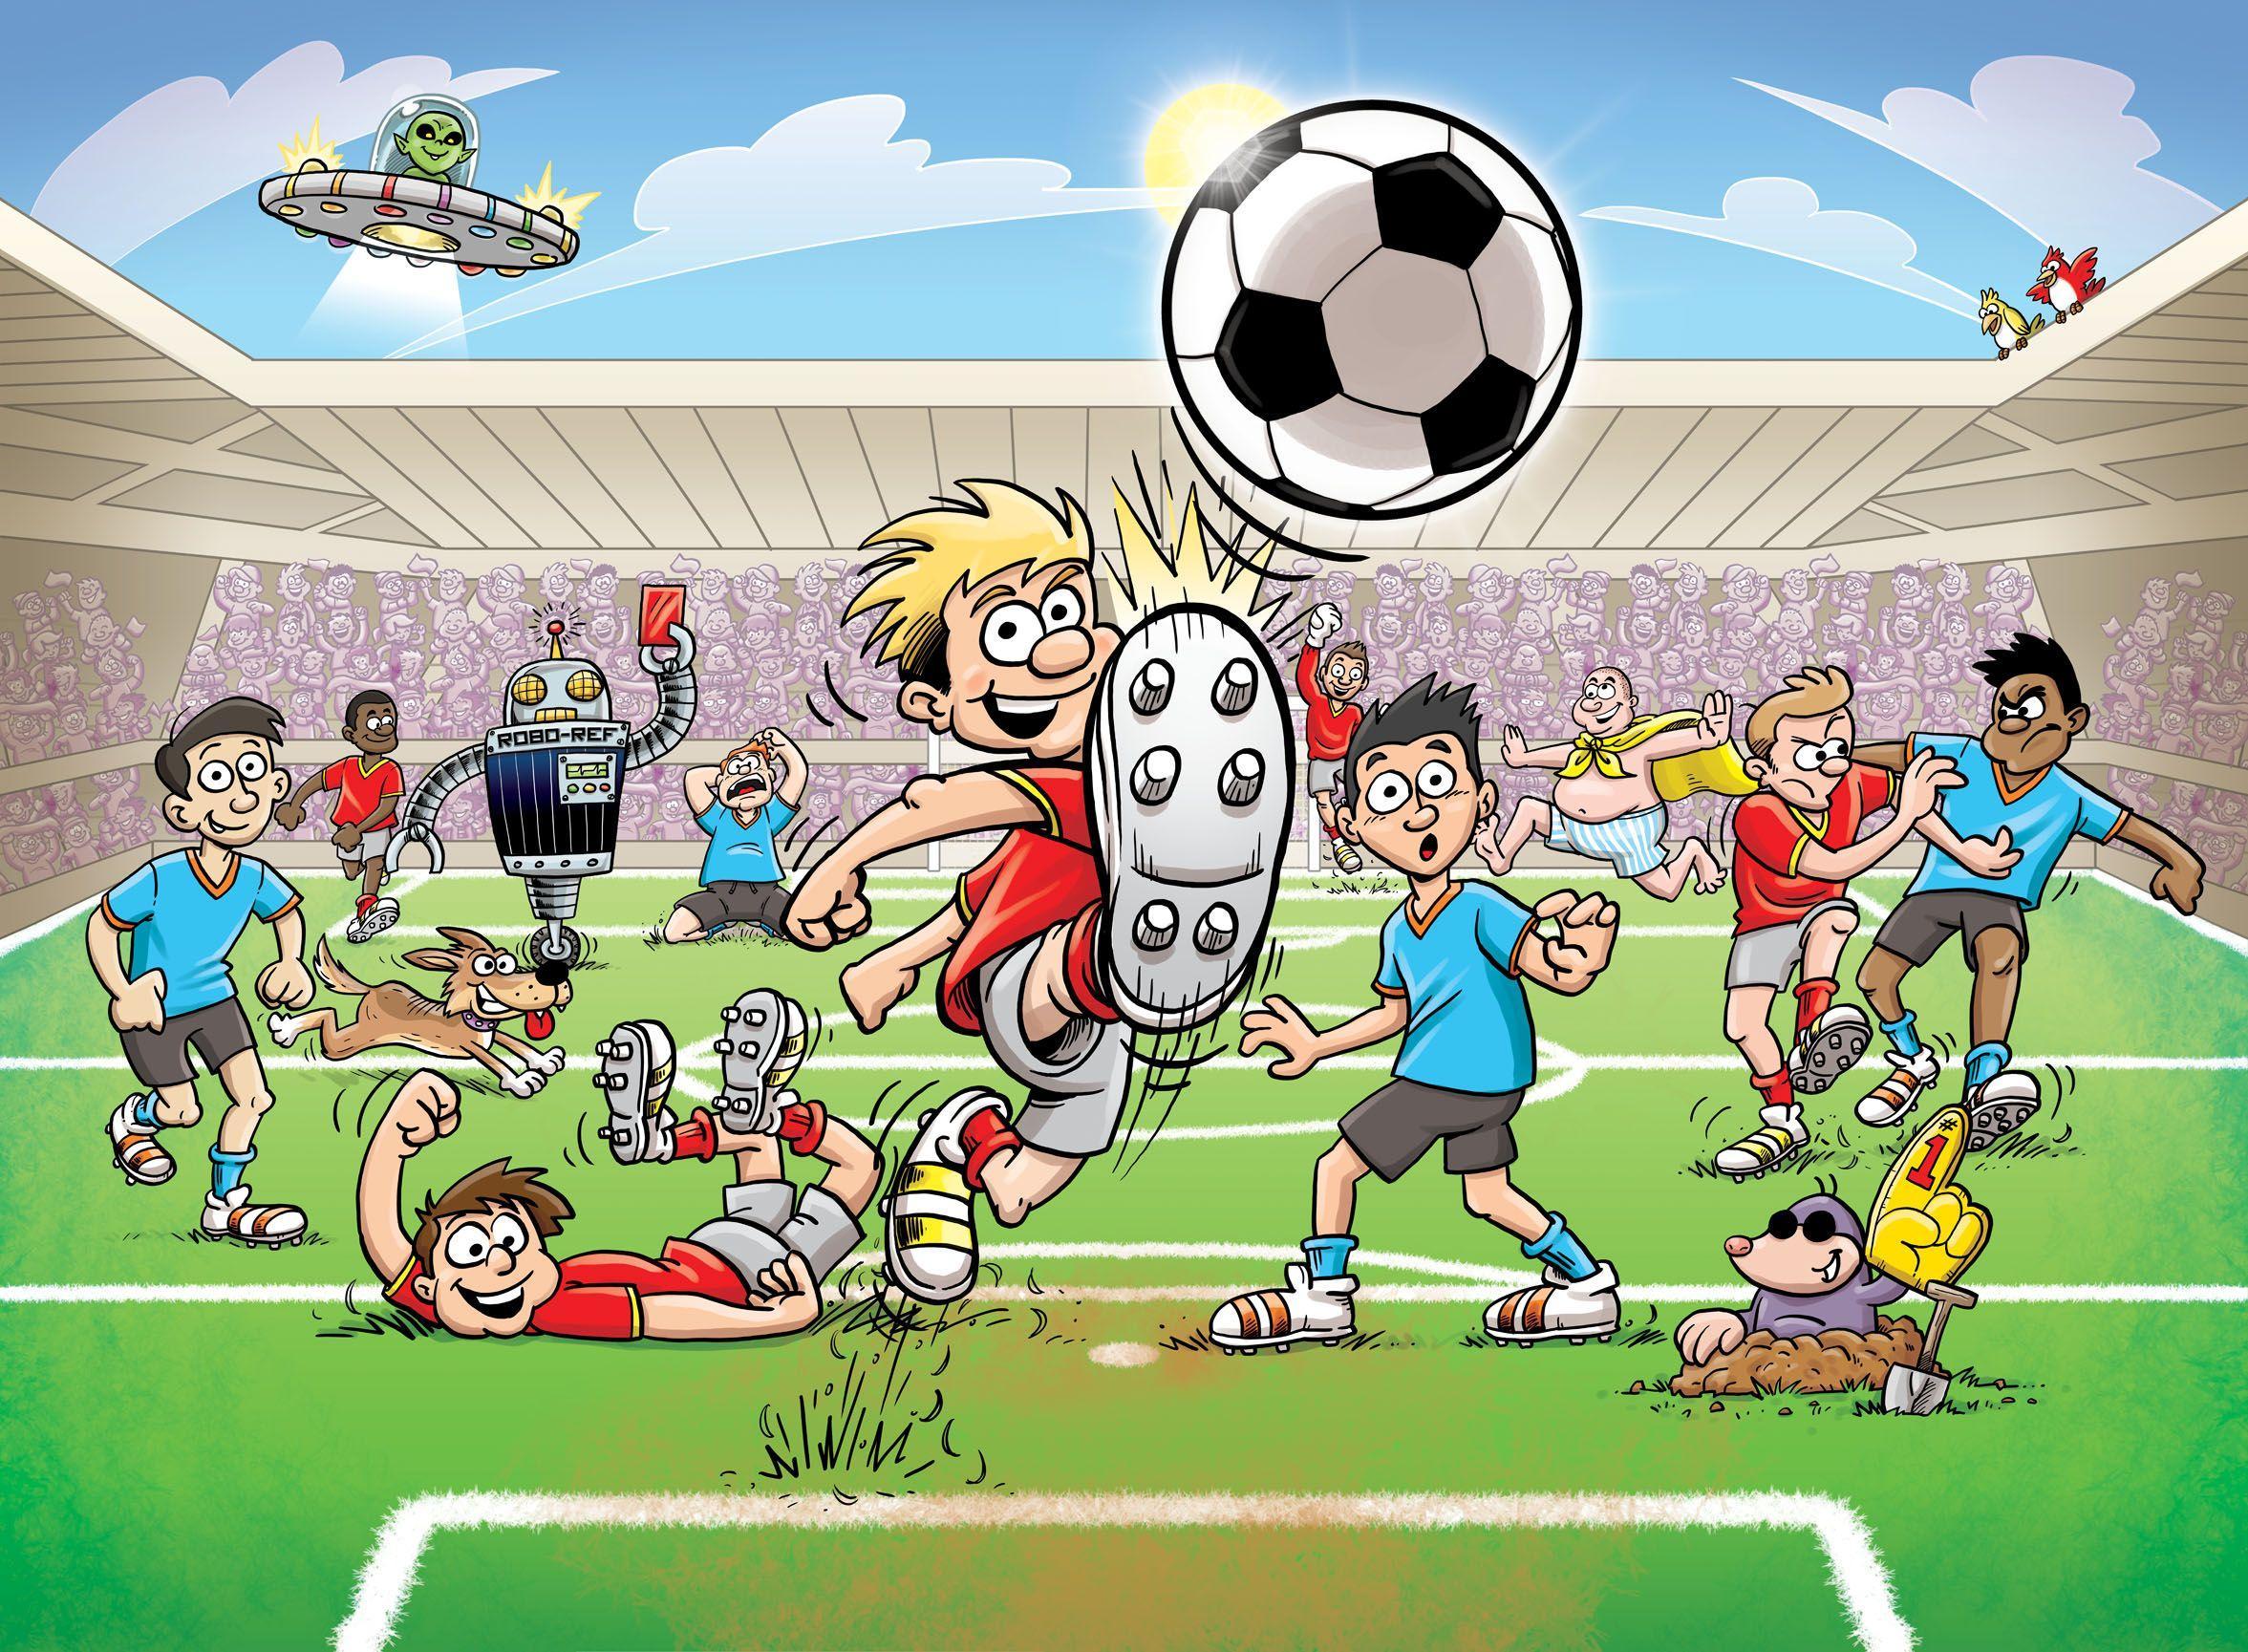 Sport Wallpaper Cartoon: Football Cartoon Wallpapers